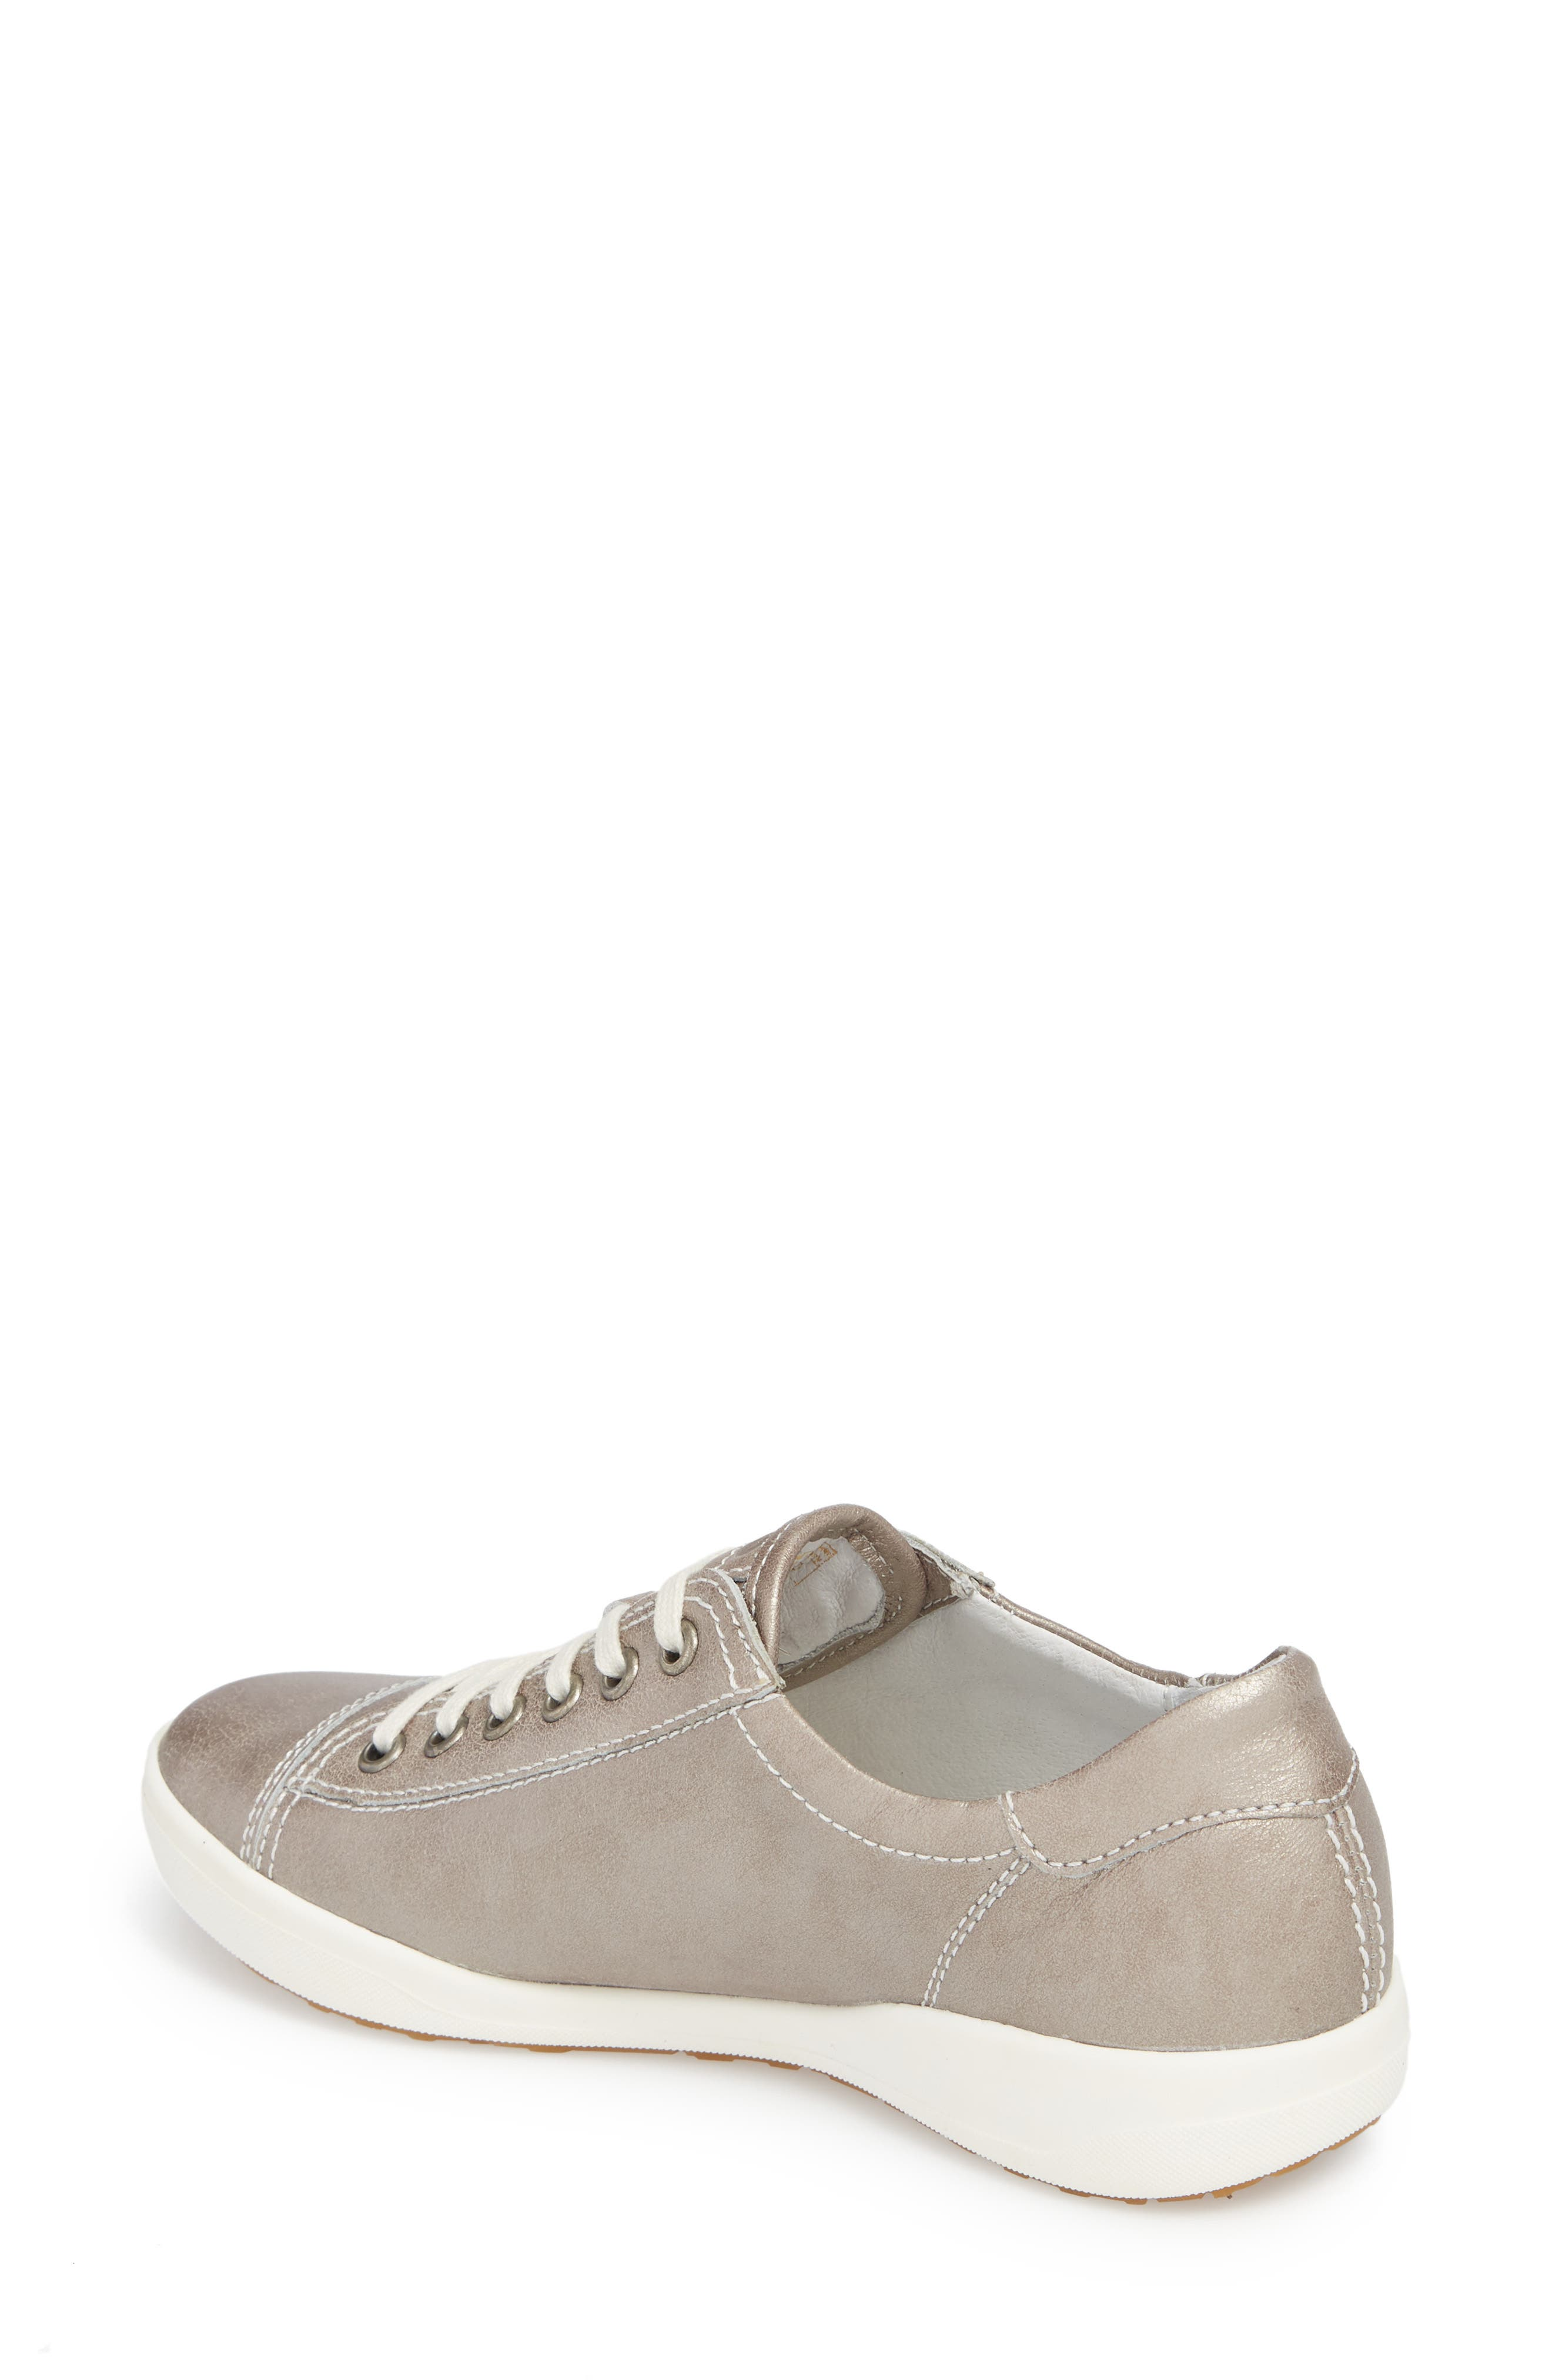 Sina 11 Sneaker,                             Alternate thumbnail 2, color,                             Platin Leather